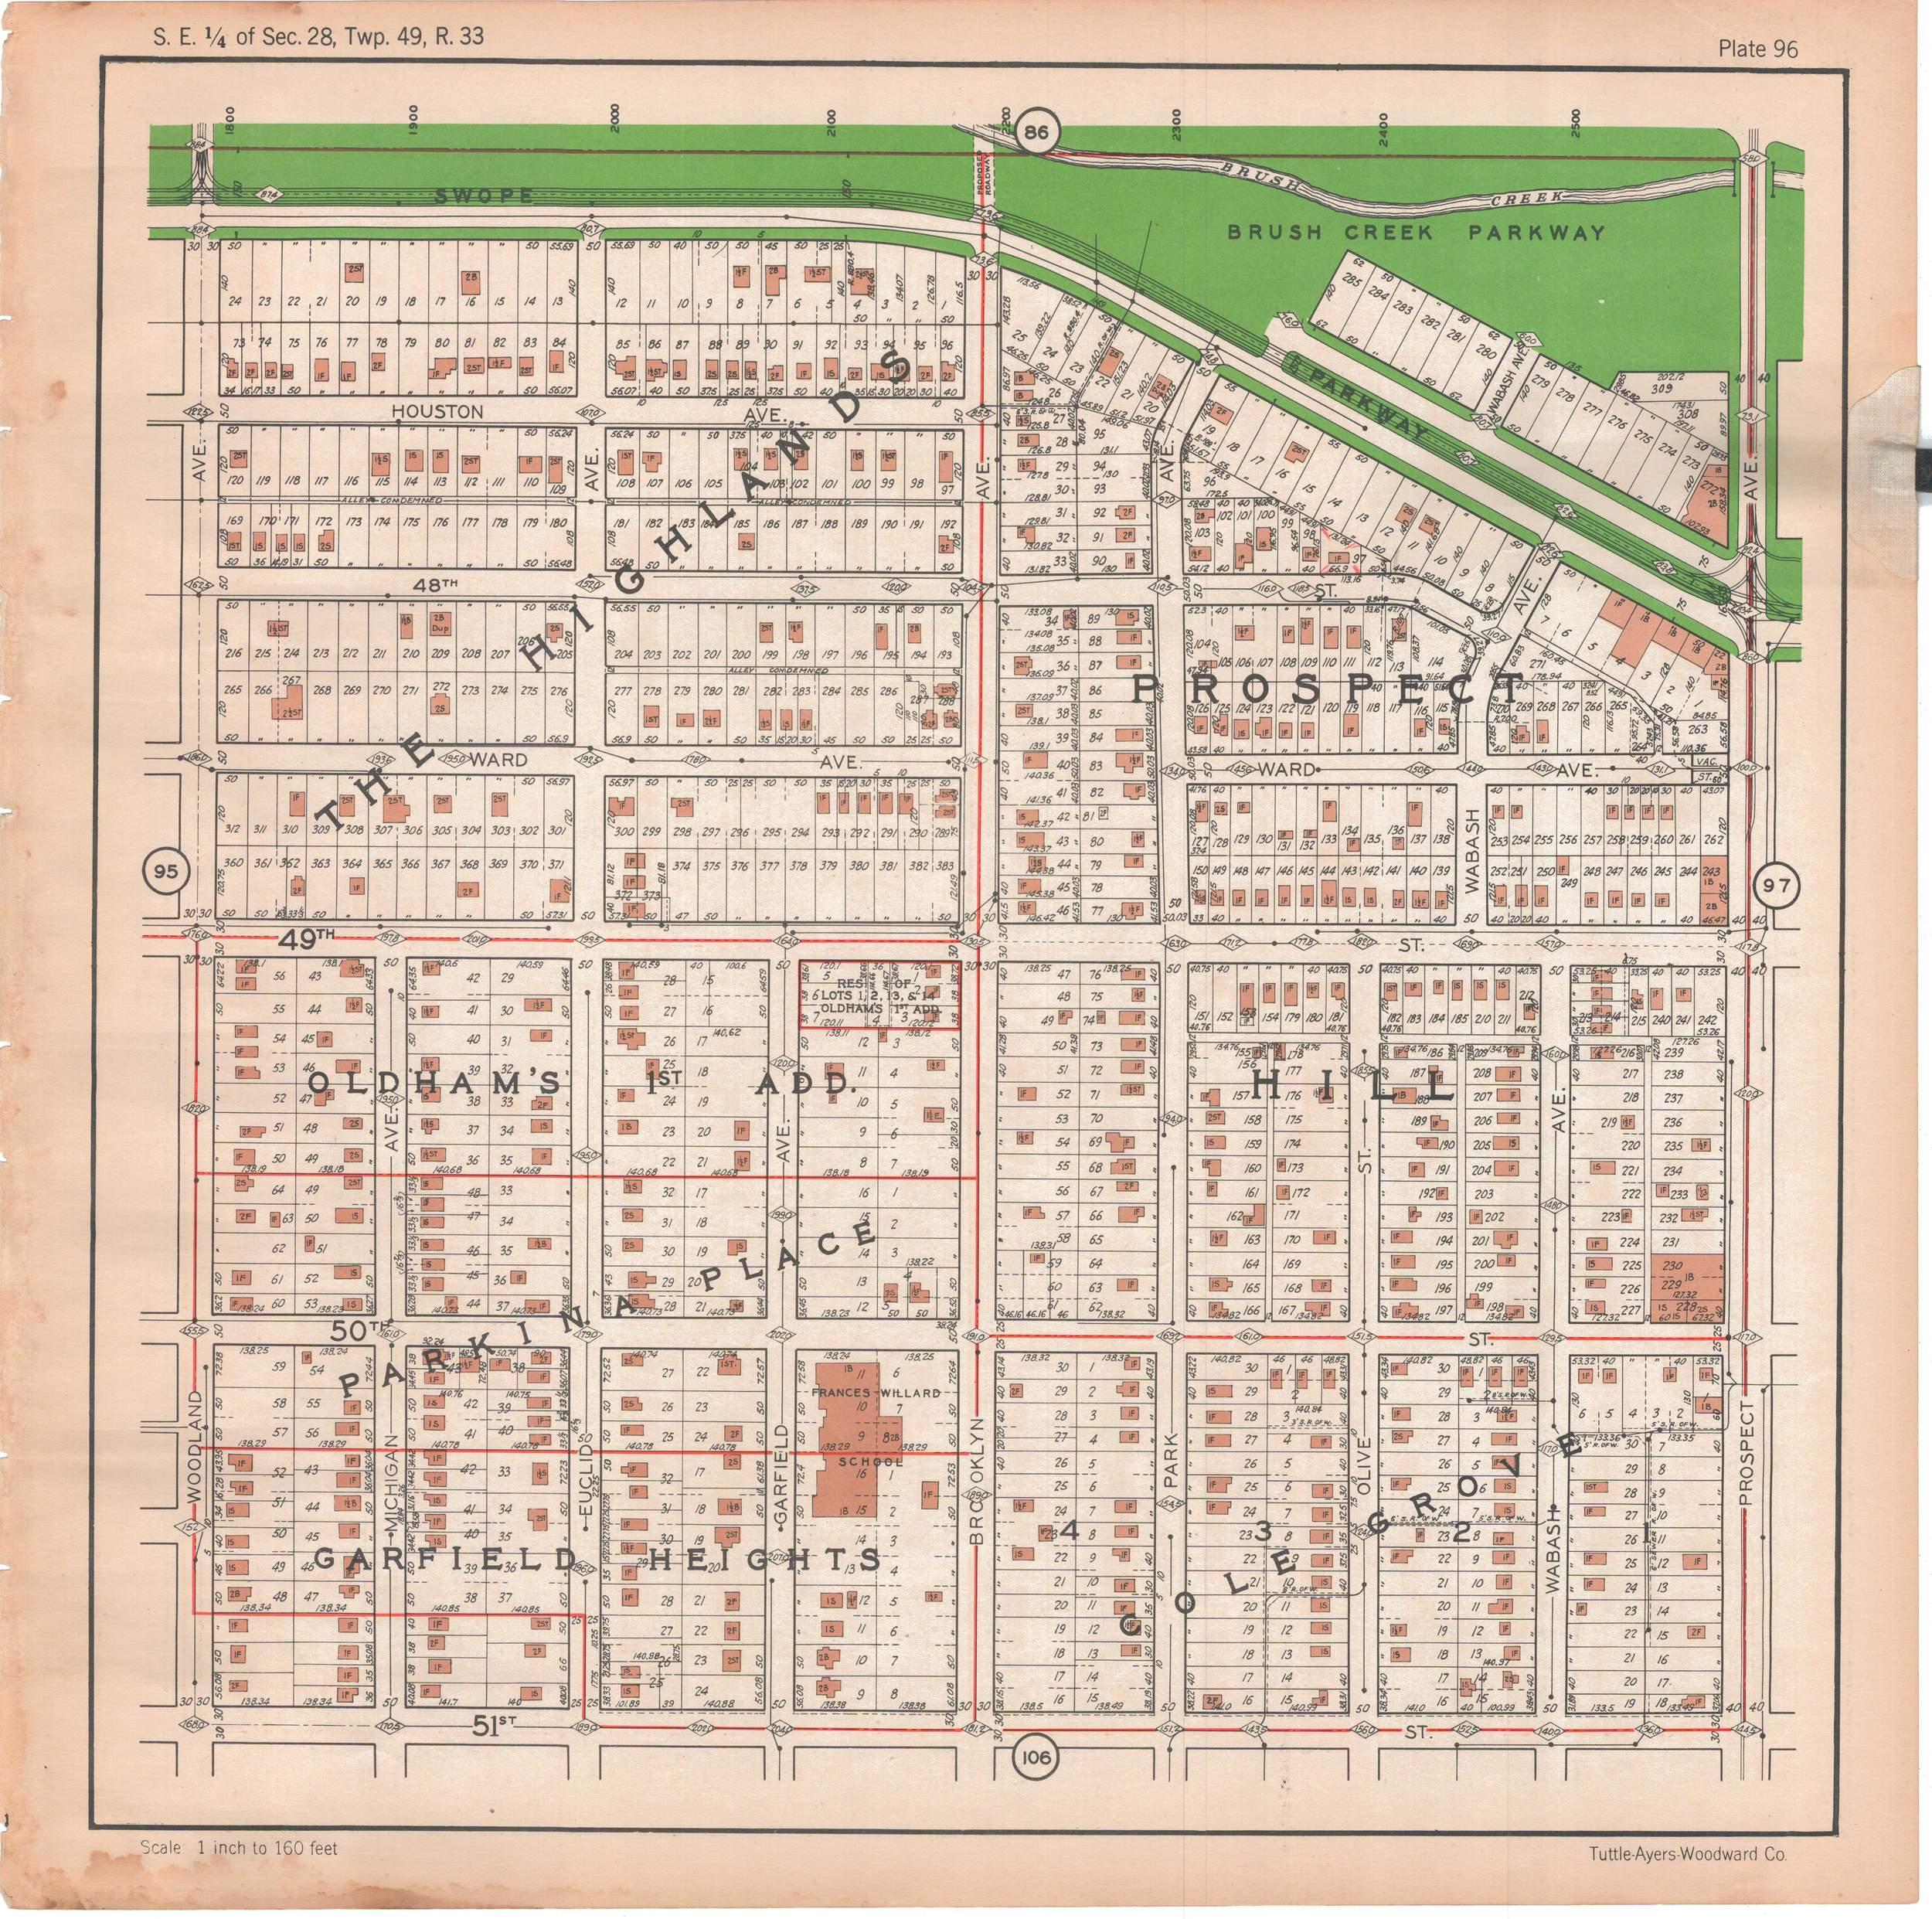 1925 TUTTLE_AYERS_Plate 96.JPG